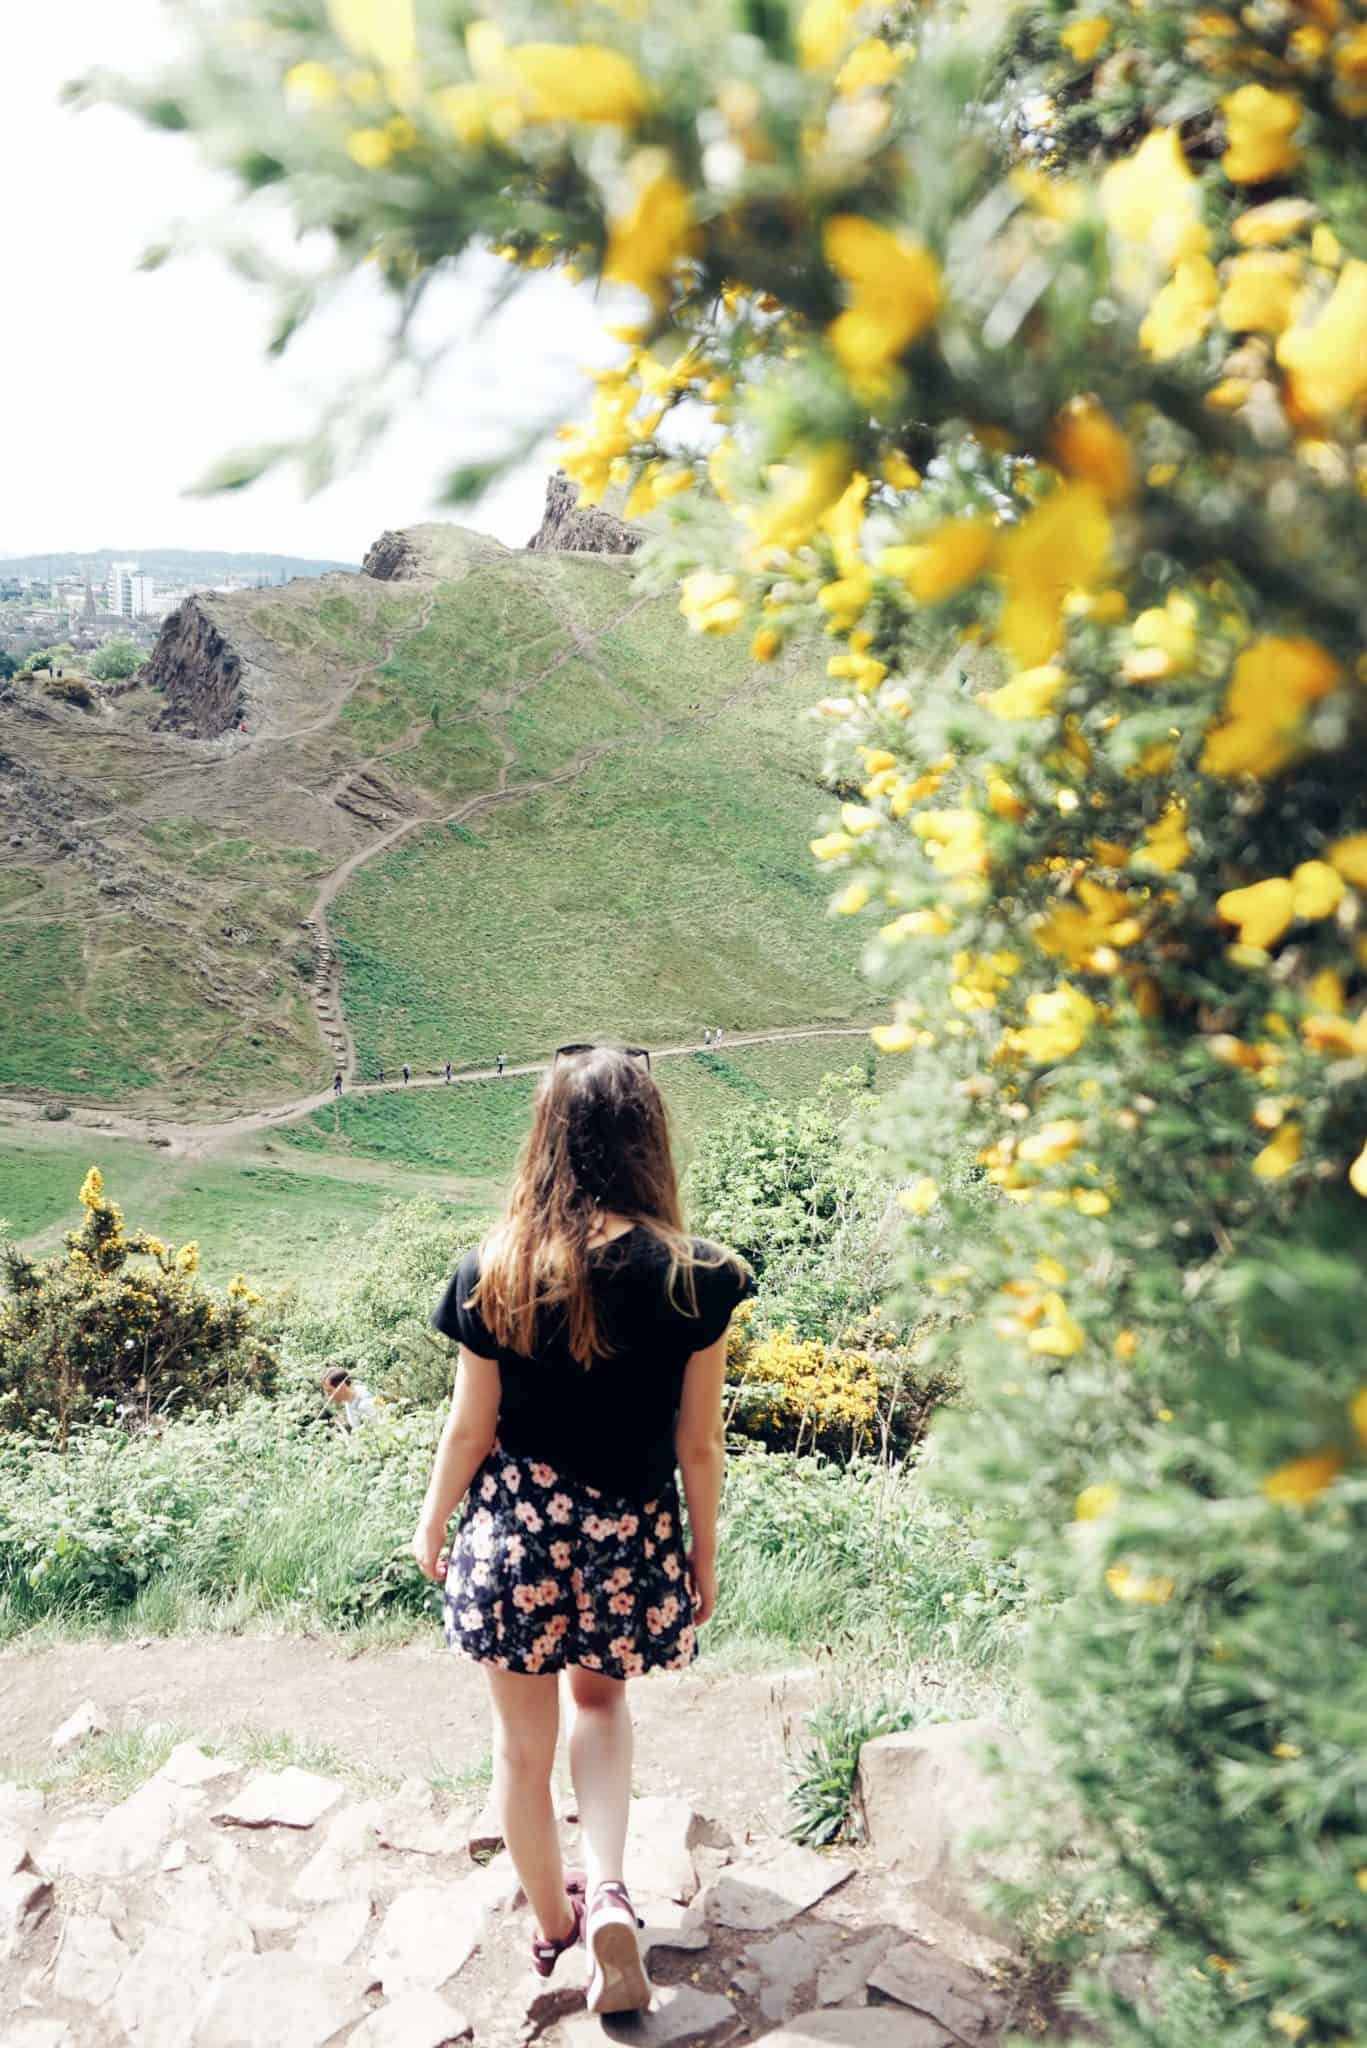 Hiking Arthur's Seat: Climbing an Extinct Volcano in Edinburgh, Scotland